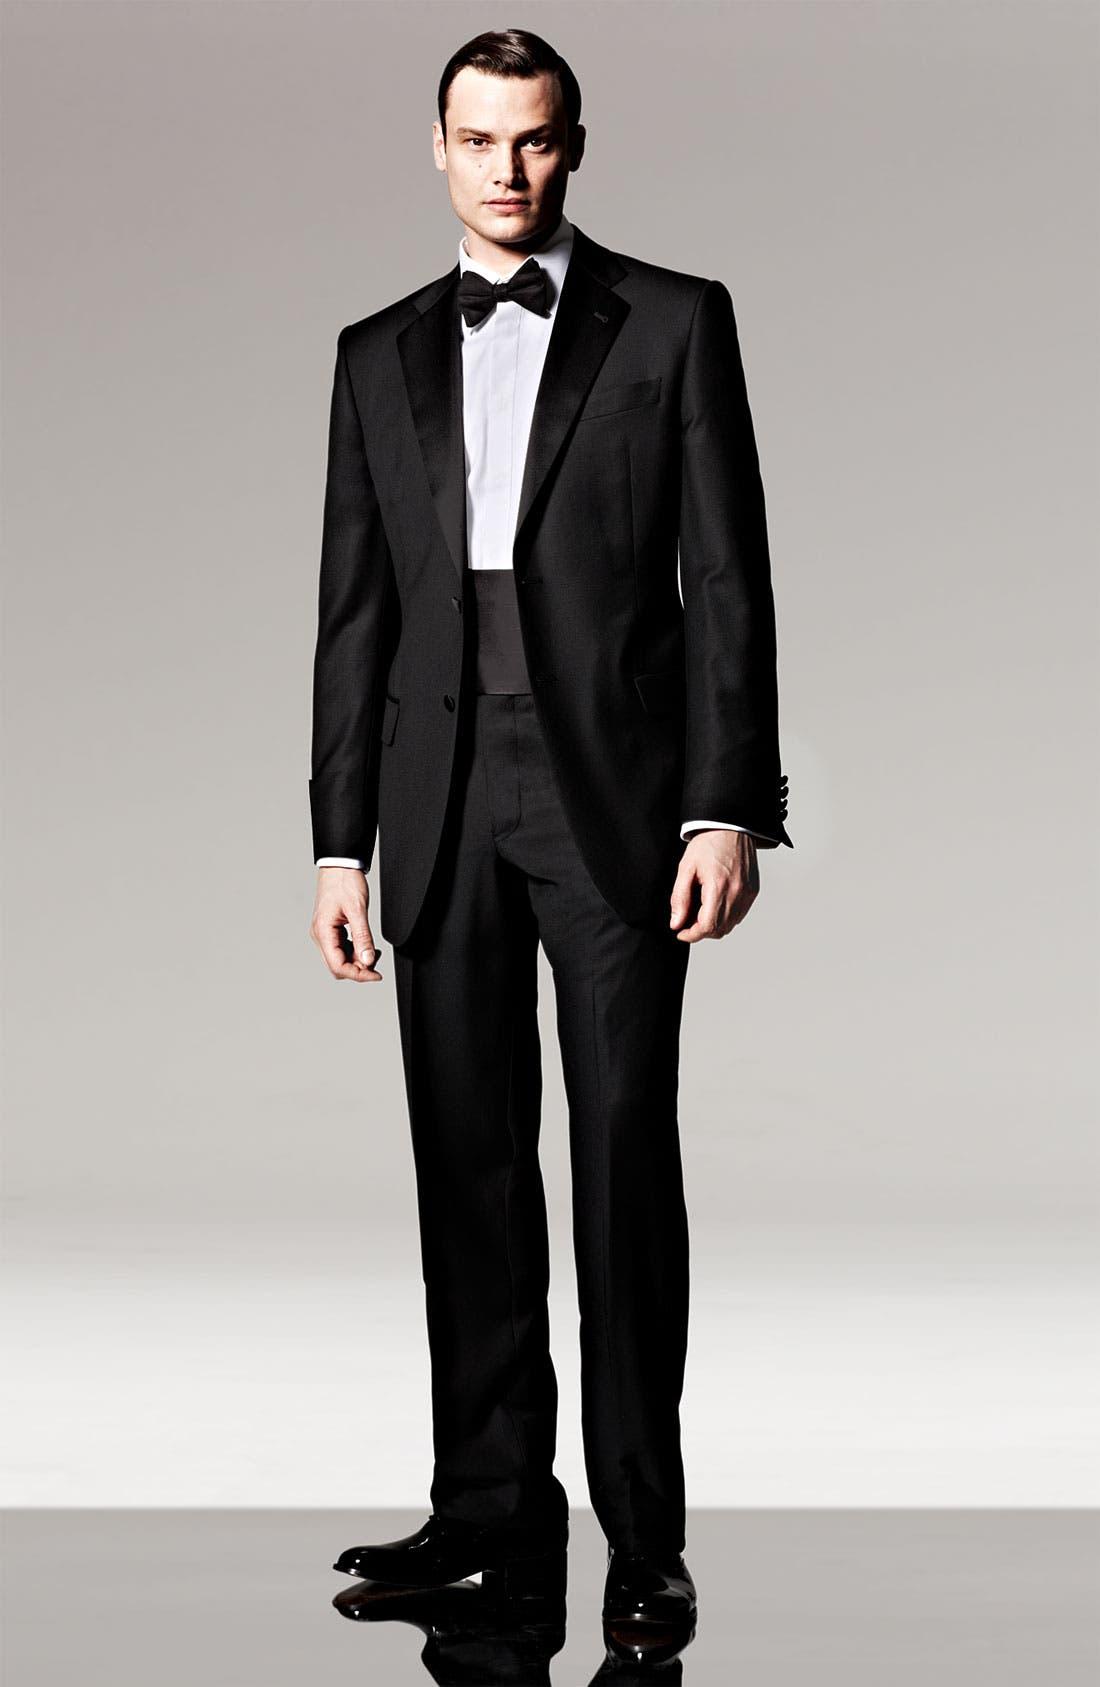 Main Image - Joseph Abboud Super 120s Wool Tuxedo & David Donahue French Cuff Tuxedo Shirt